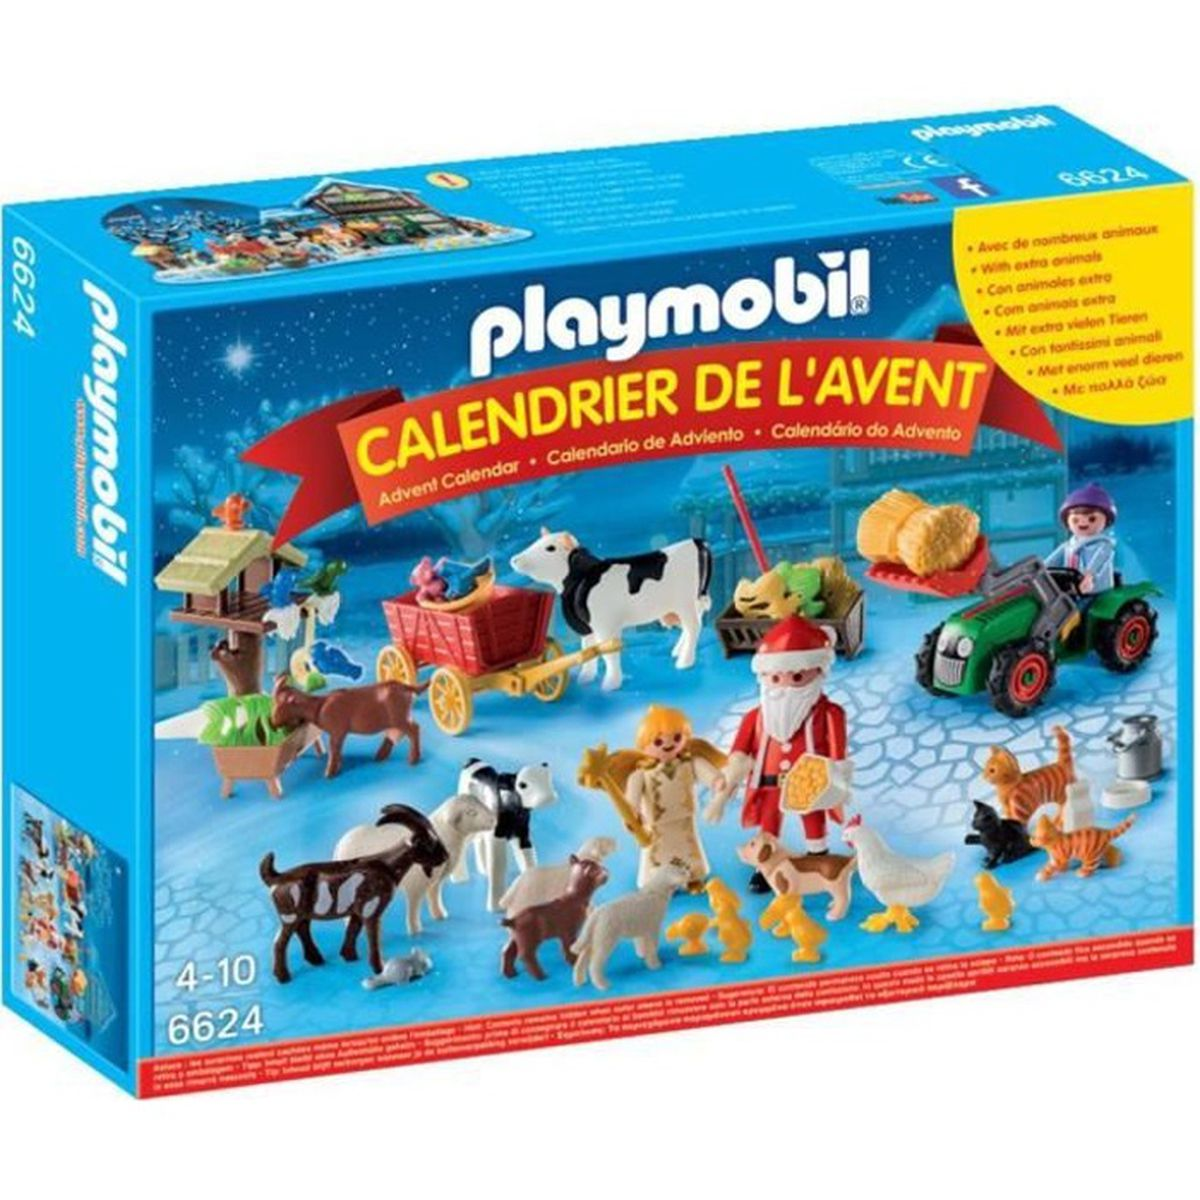 playmobil 6624 calendrier de l 39 avent p re no l la ferme. Black Bedroom Furniture Sets. Home Design Ideas